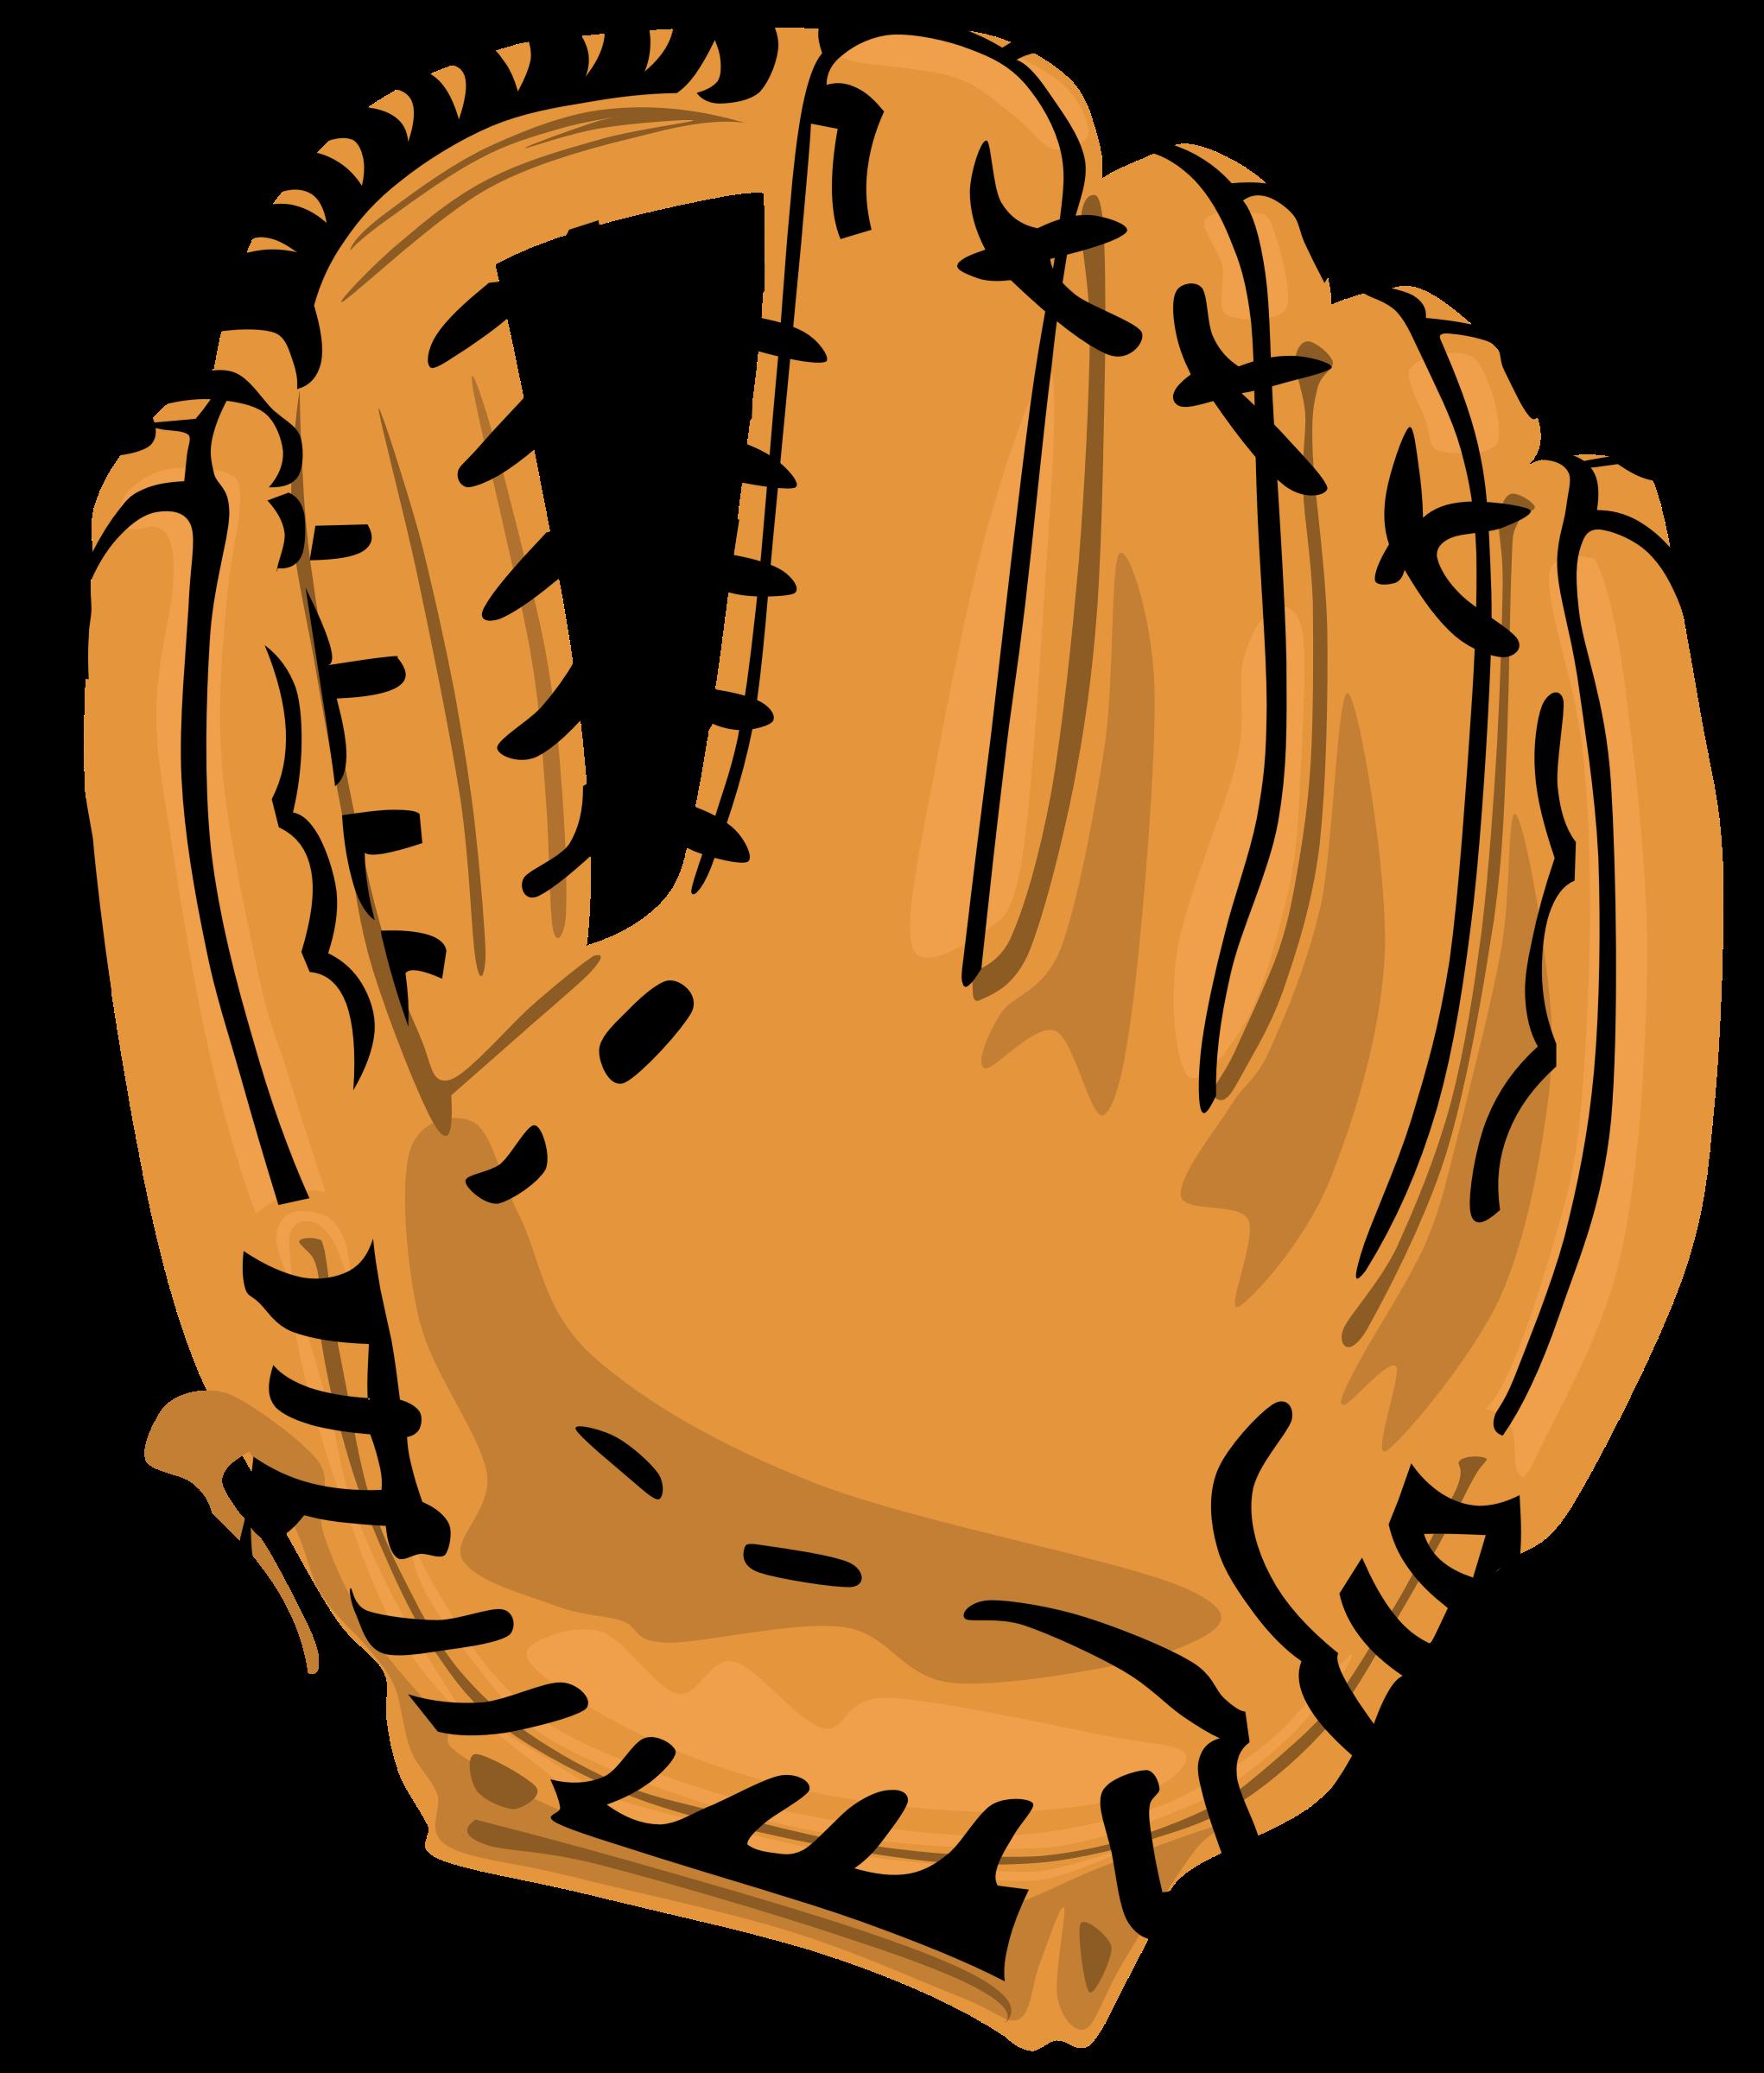 Gloves clipart transparent background. Baseball glove